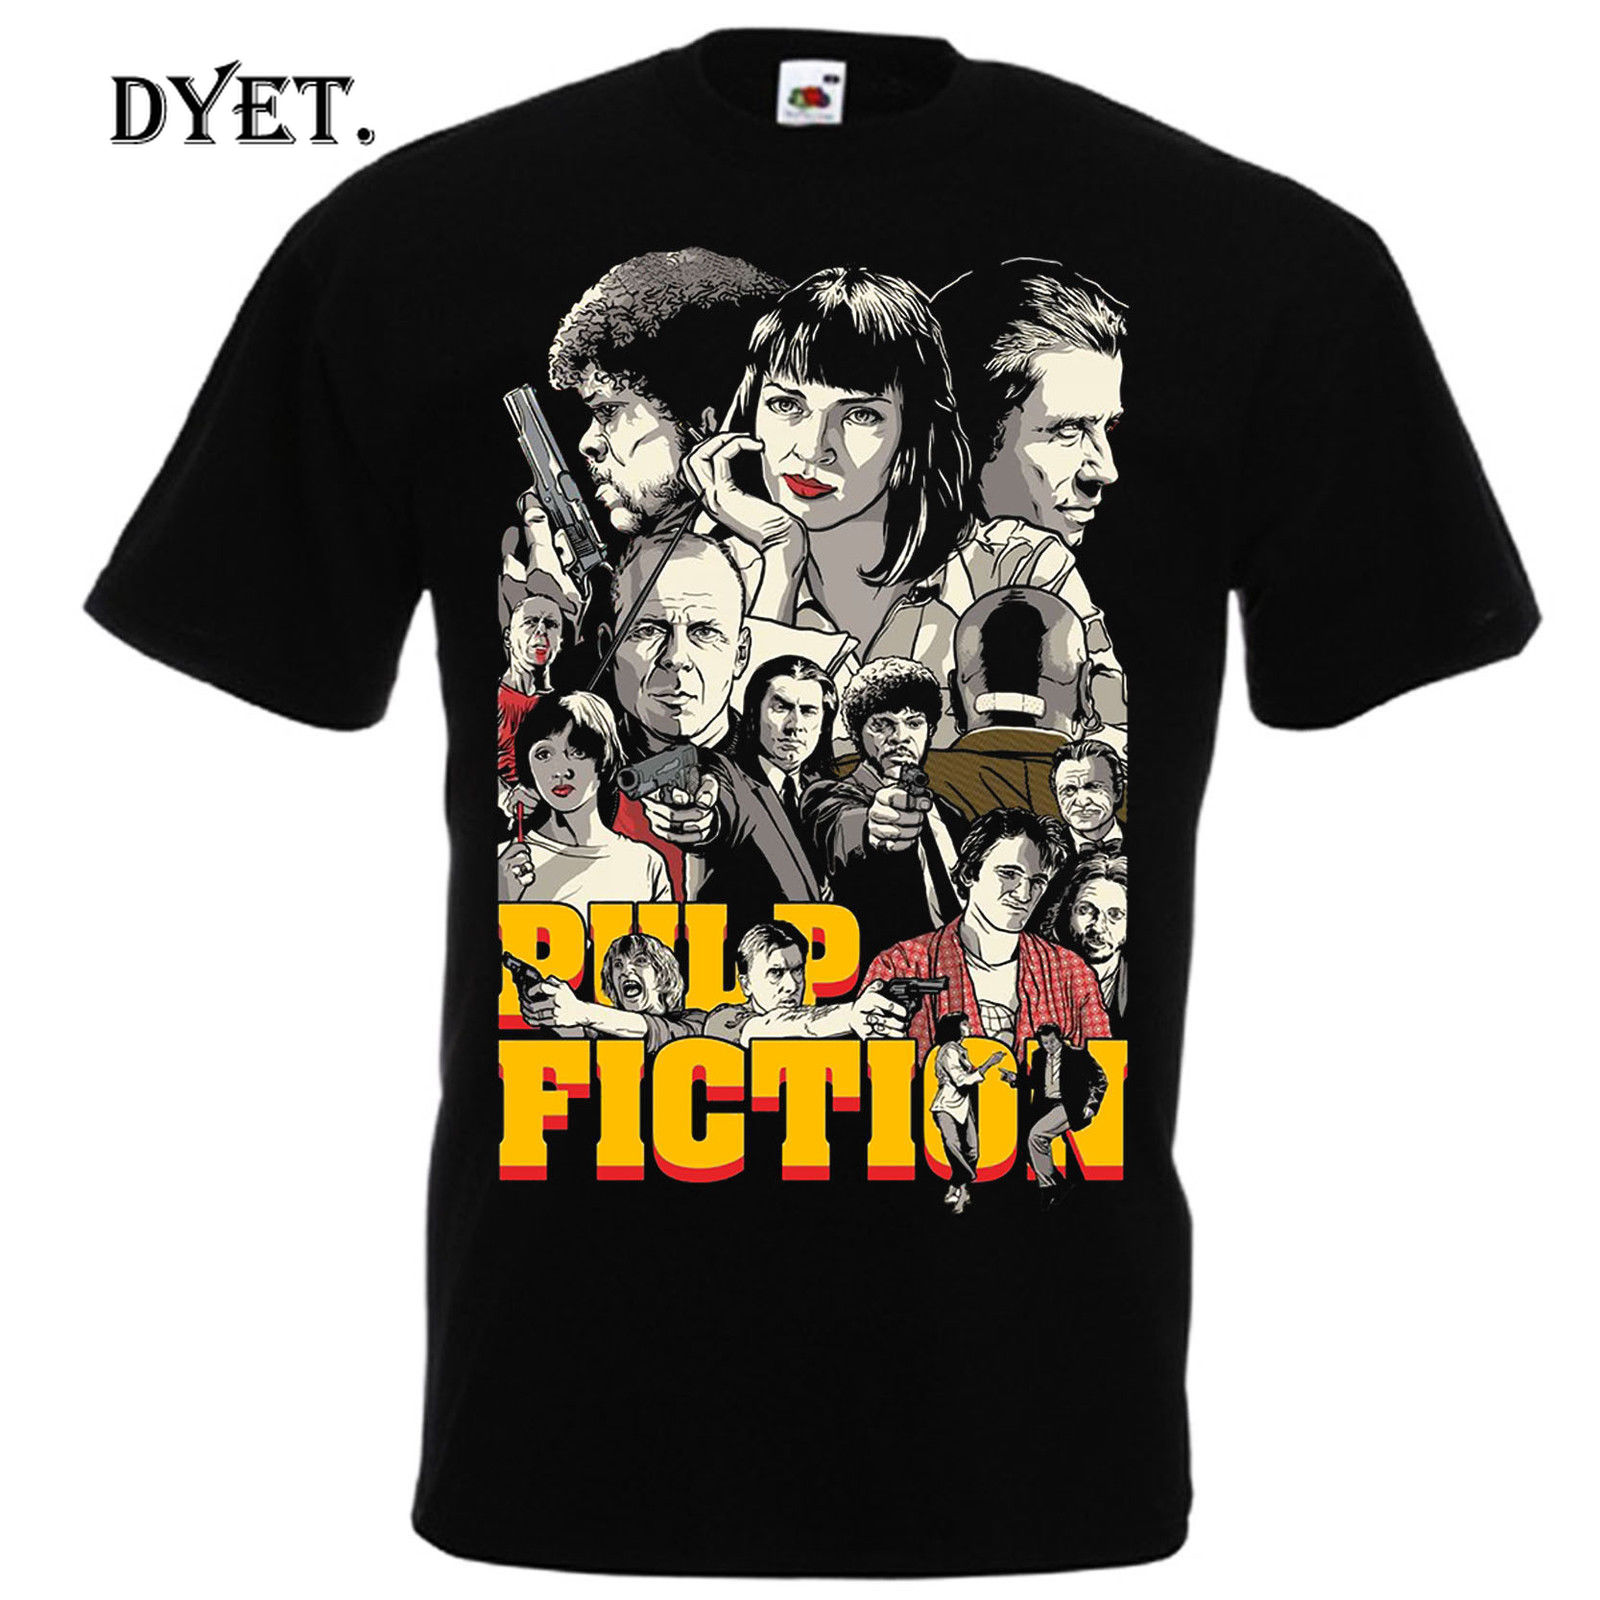 pulp-fiction-black-t-shirt-quentin-tarantino-'94-john-travolta-samuel-l-jackson-men-brand-printed-100-cotton-t-shirt